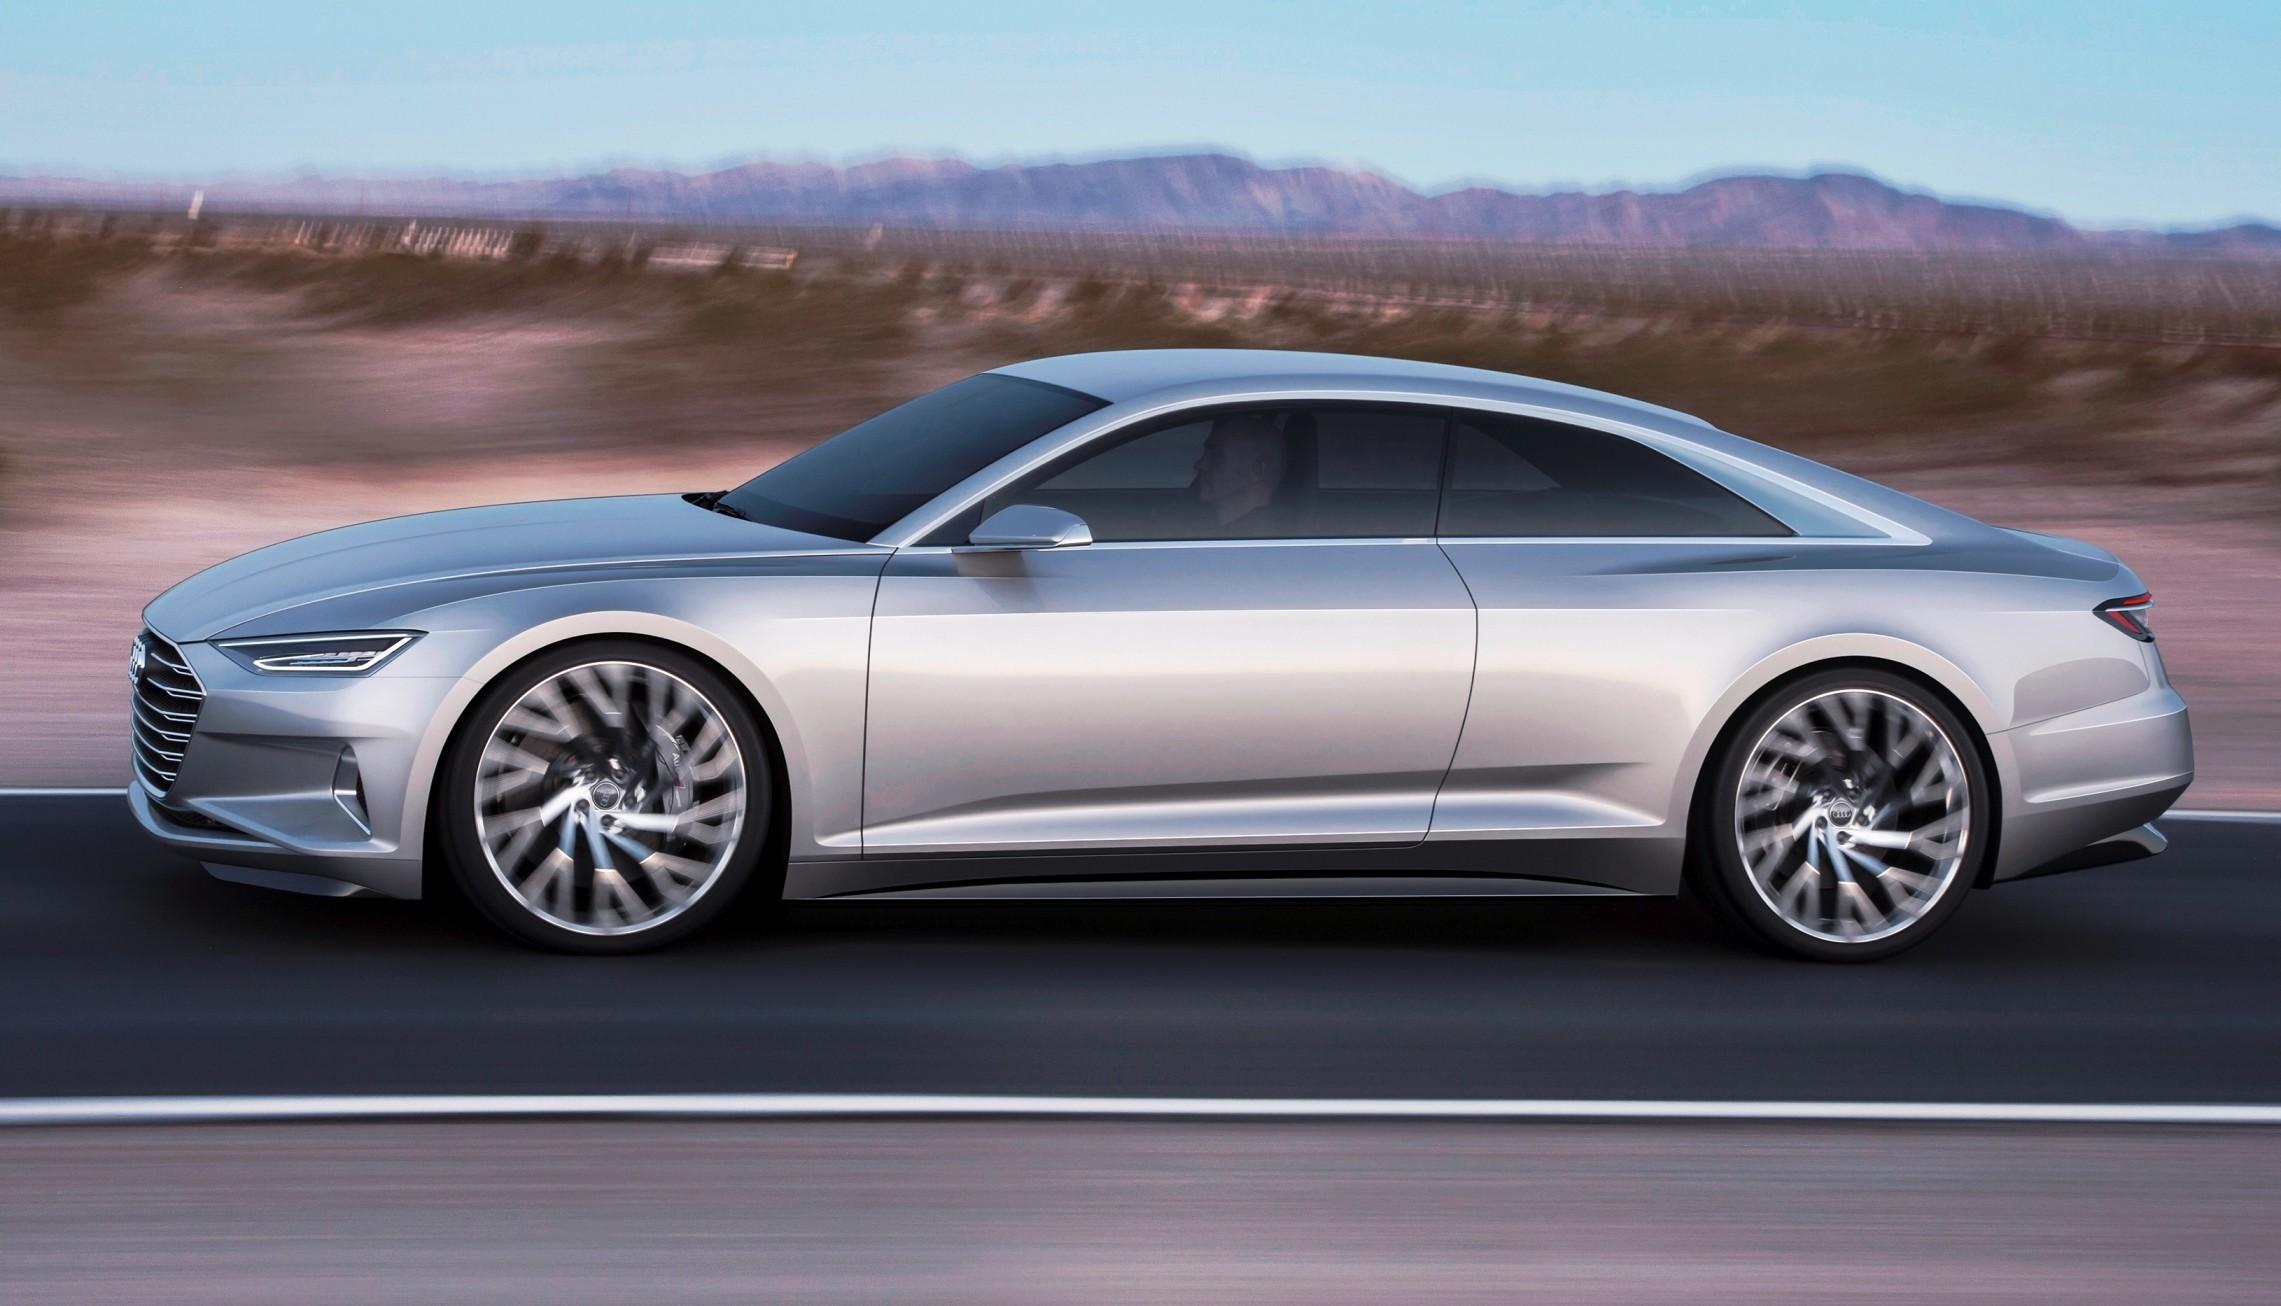 2014 Audi Prologue is Worst of LA 2014 28